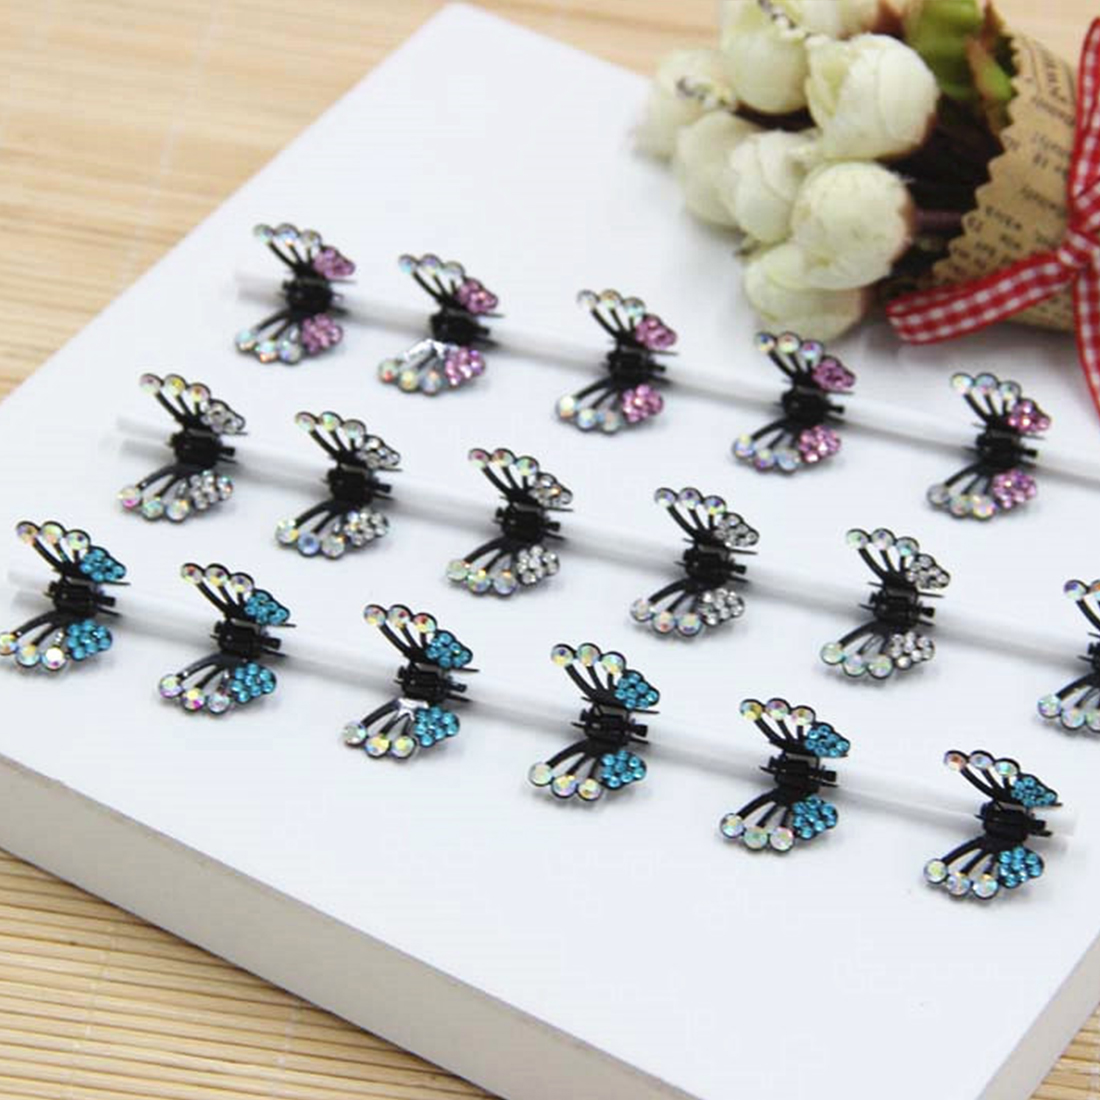 6 Pcs/Lot Mini Hair Accessory Hair Clip For Girls Artificial Rhinestone Butterfly Shape  Hair Claw Hairpins Ladies Women Girls